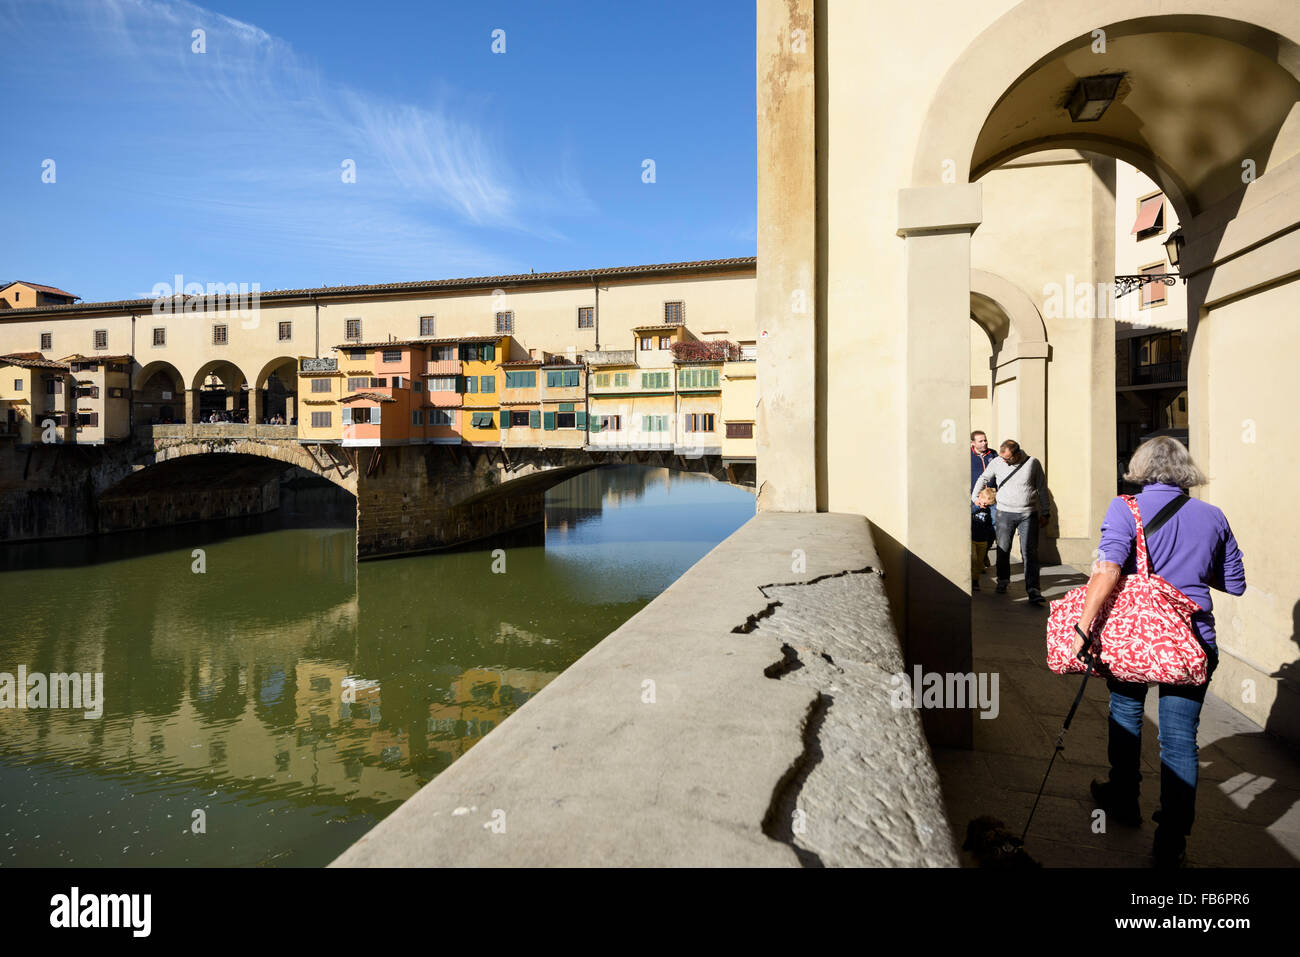 Florence. Italy. The Vasari Corridor runs alongside the River Arno and crosses via the Ponte Vecchio. - Stock Image